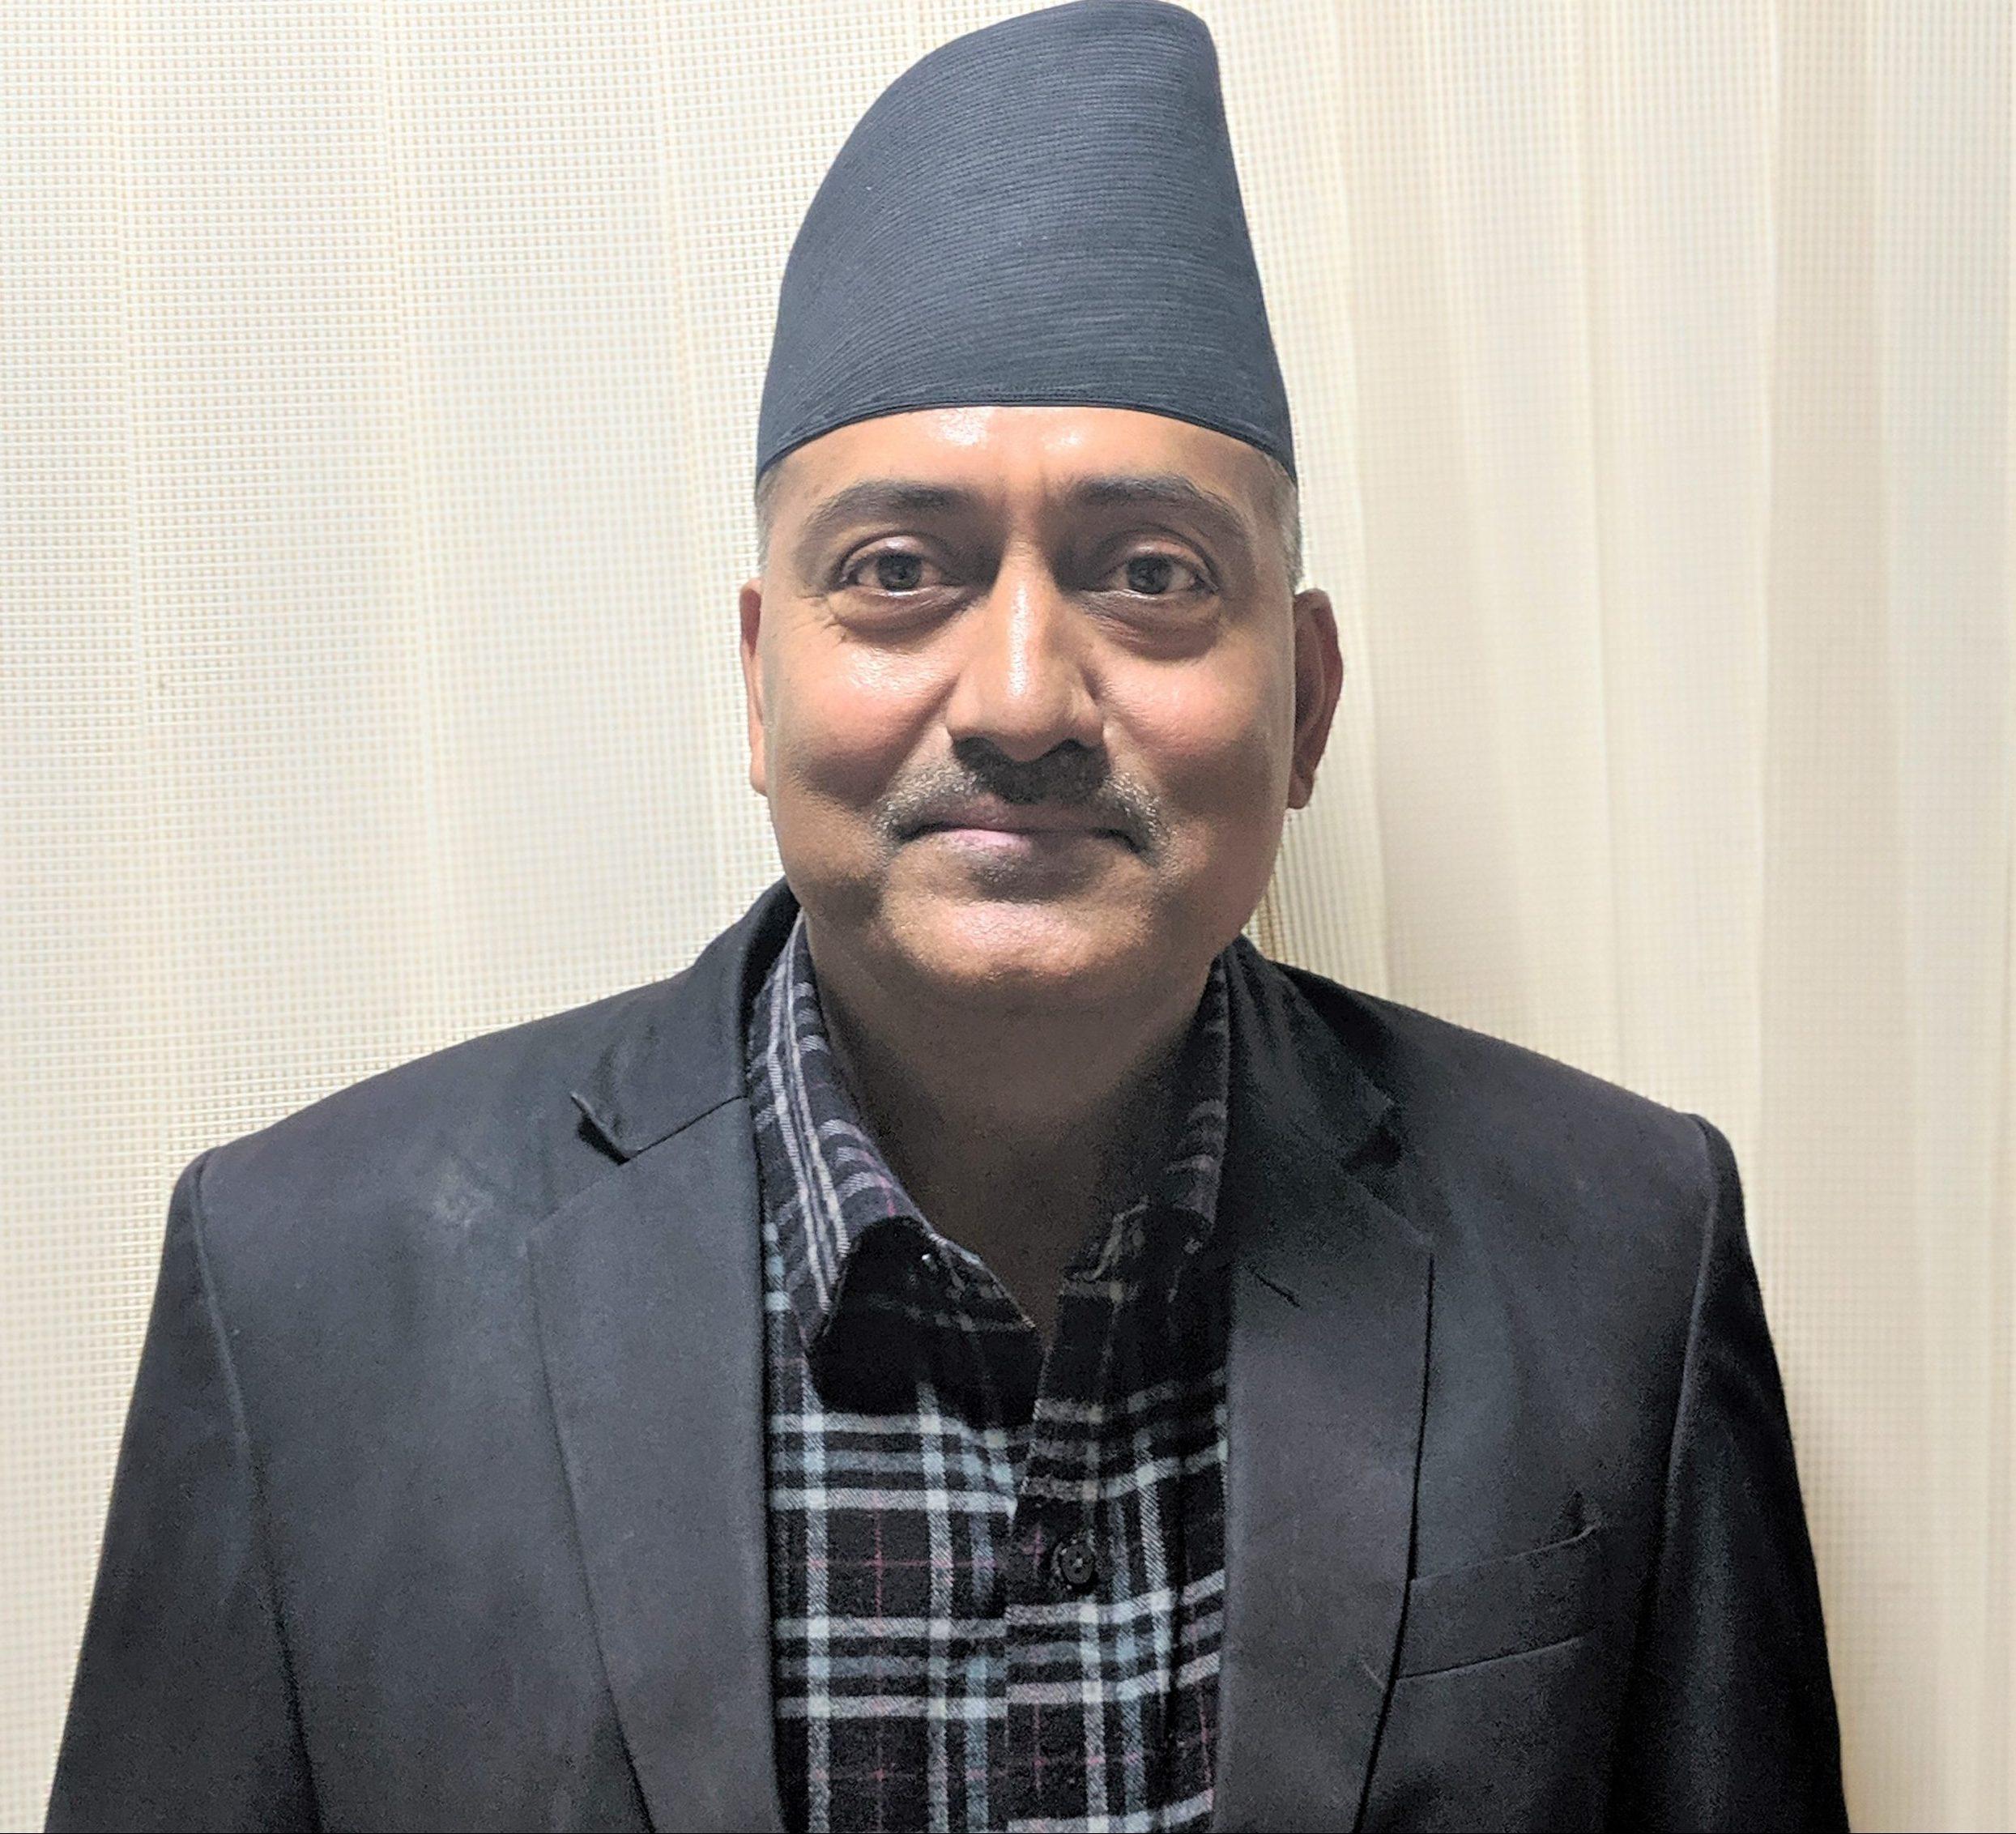 Mr. Ram Chandra Subedi